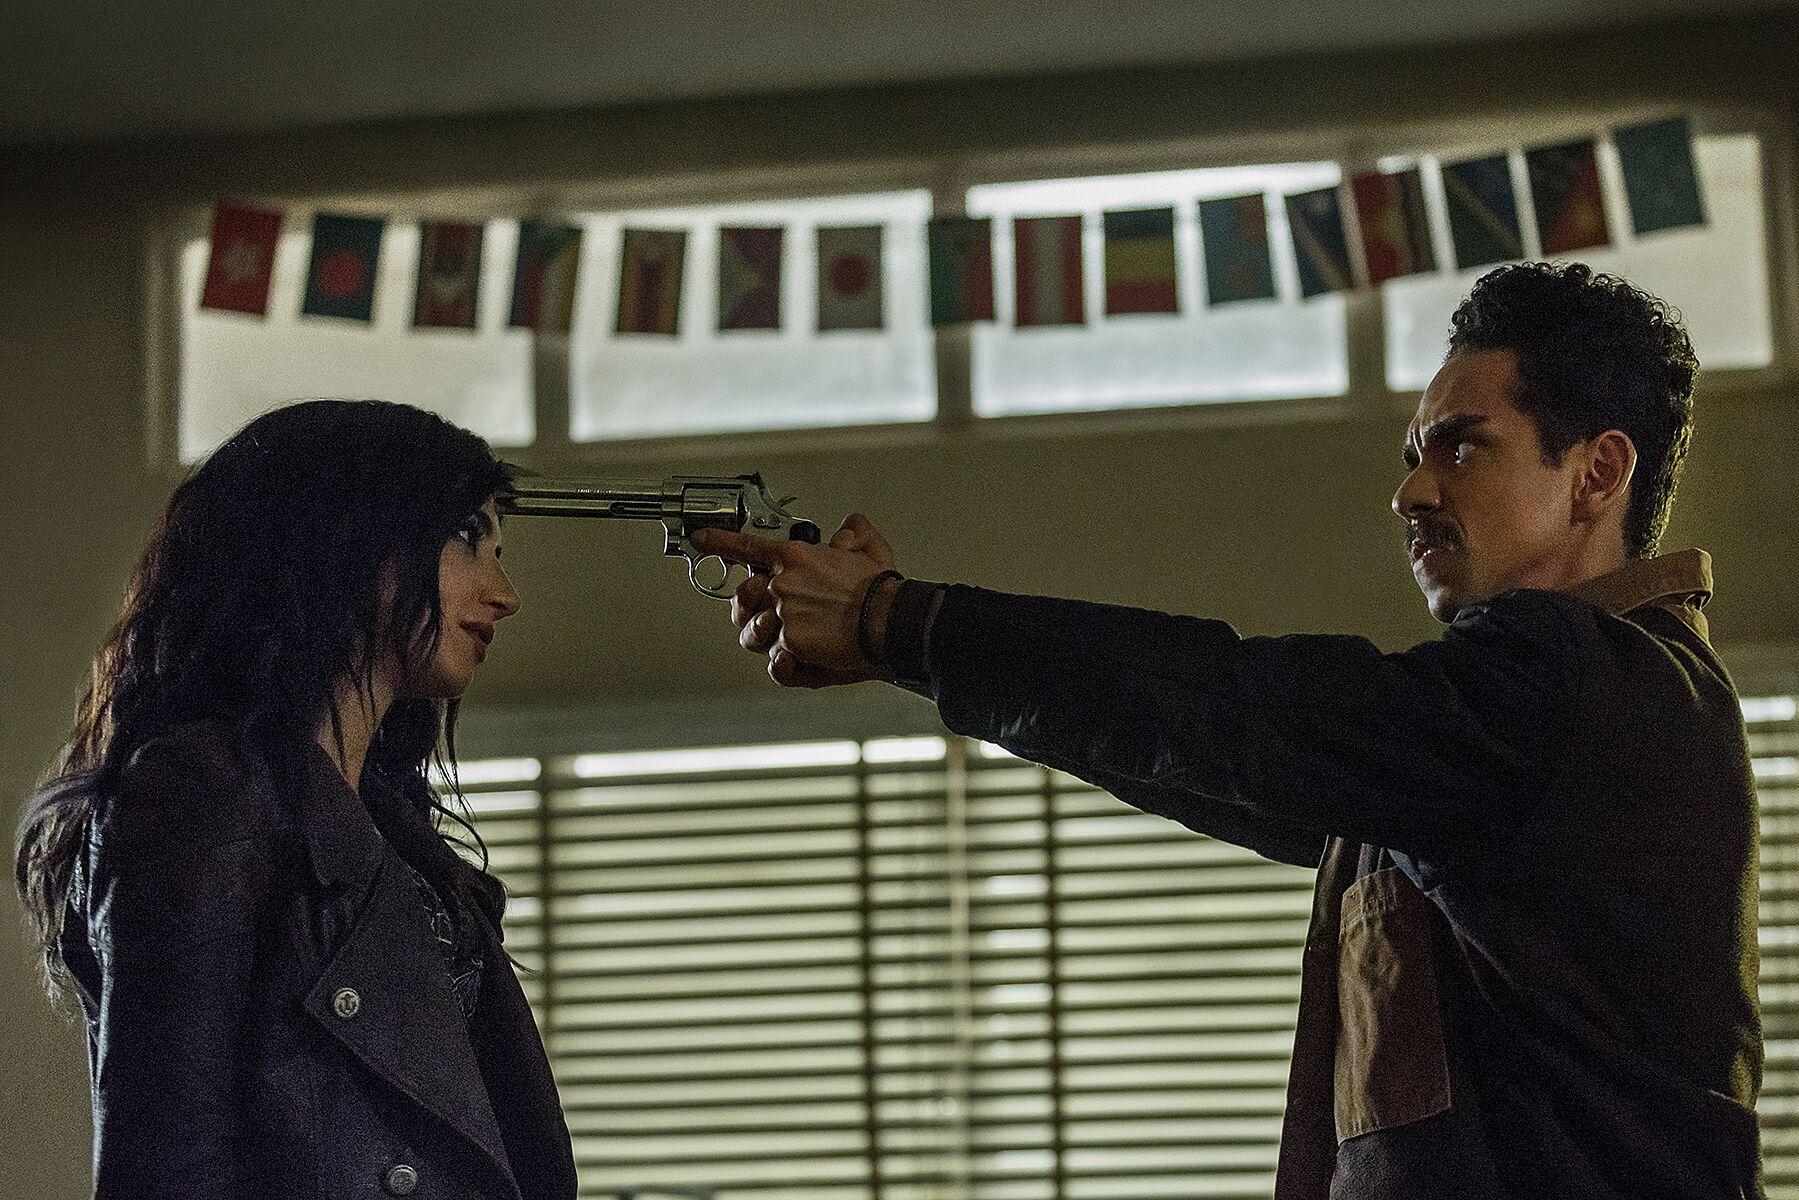 ash vs evil dead season 3 twist and shout